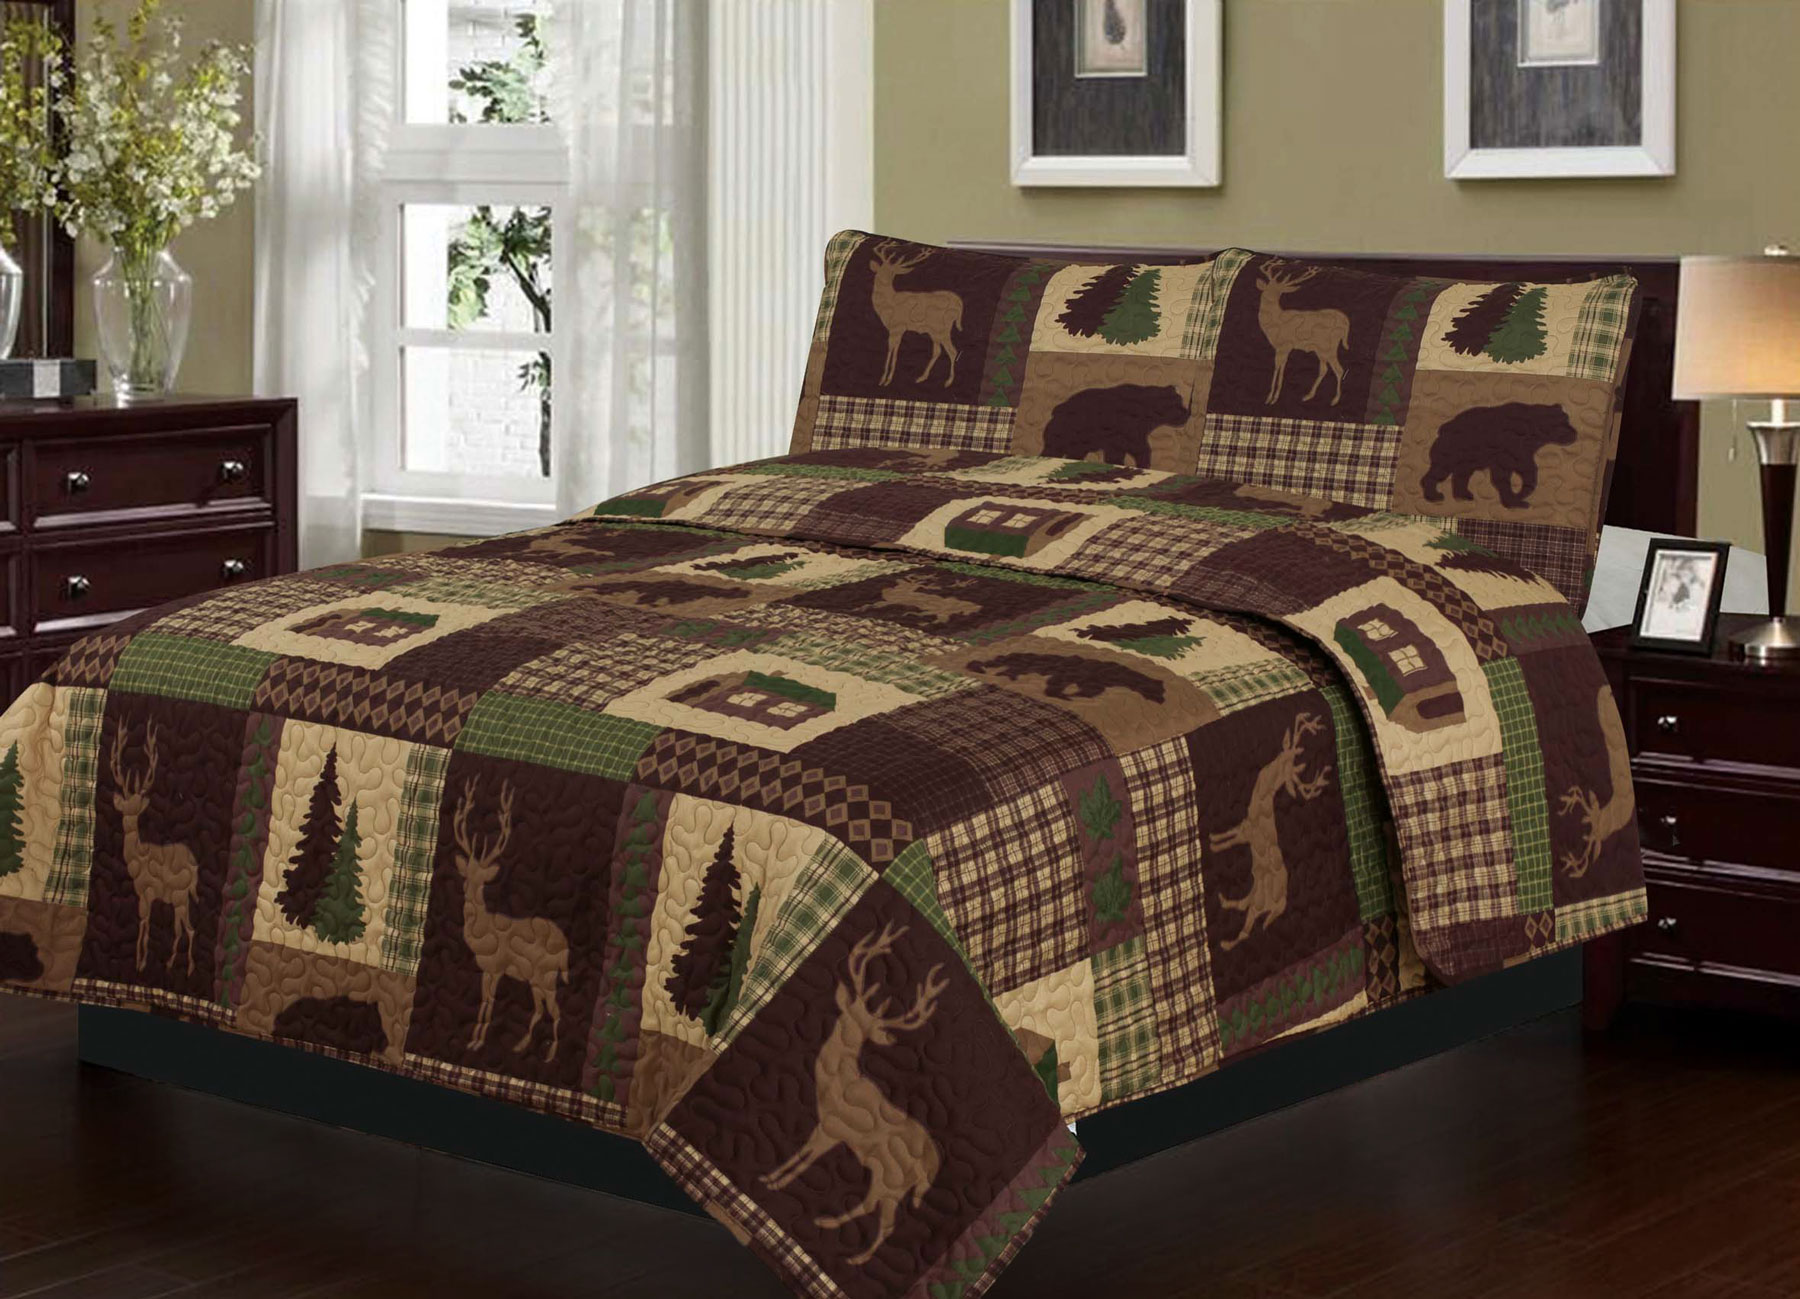 Rustic Cabin Lodge Deer And Bear 3 Piece Full Queen Quilt And Sham Set Walmart Com Cabin Bedroom Decor Bedspreads Rustic Bed Spreads